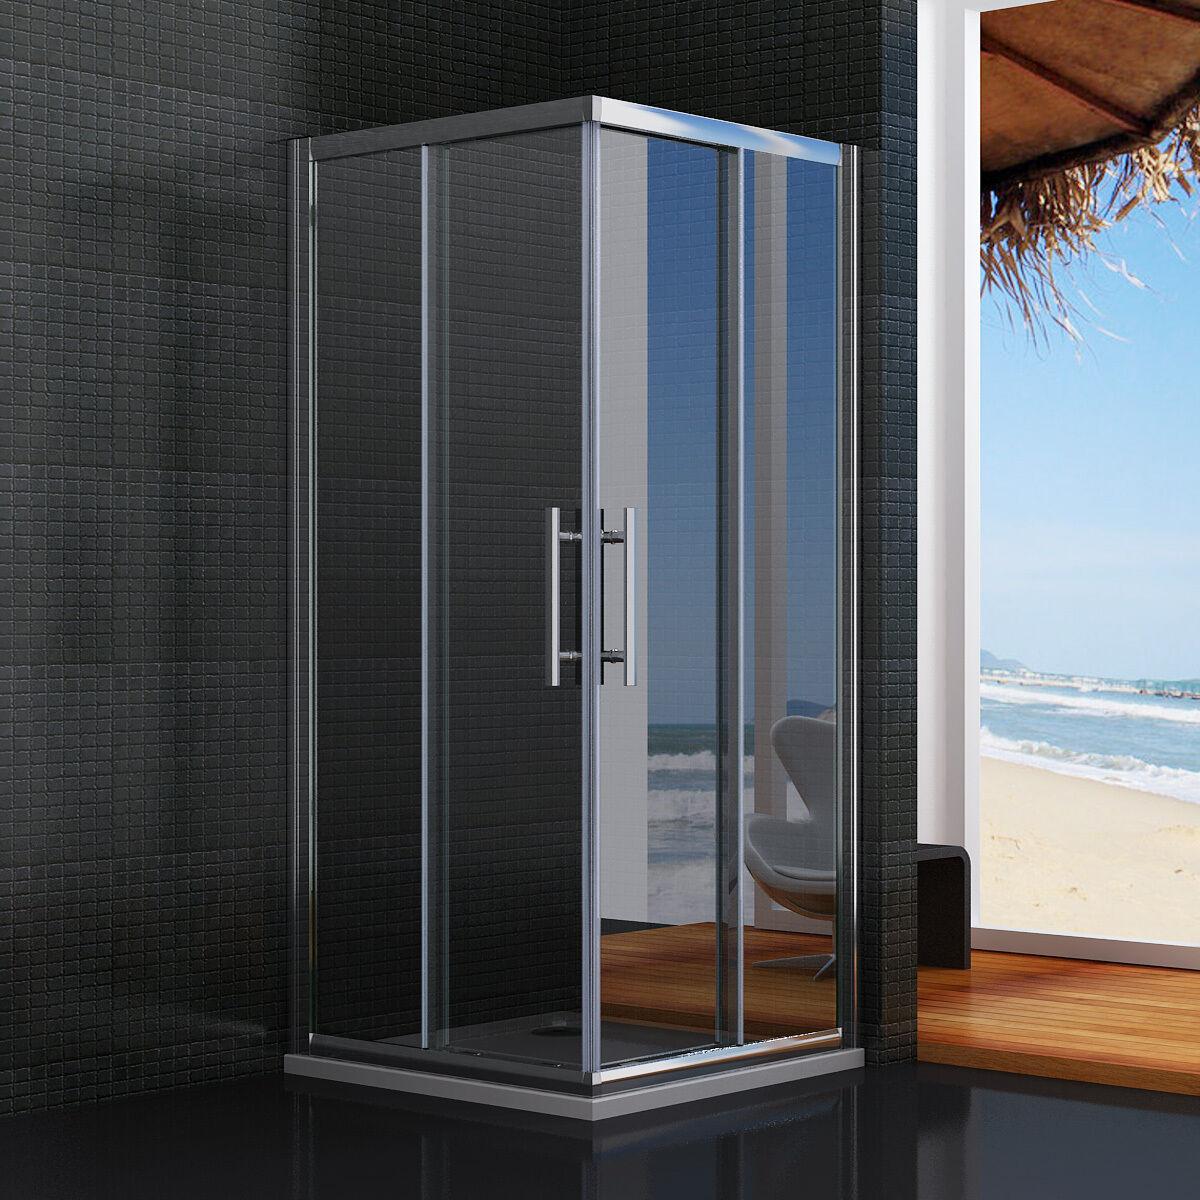 70x70x185cm duschkabine eckdusche duscht r schiebet r dusche duschabtrennung ns 6856550858707 ebay. Black Bedroom Furniture Sets. Home Design Ideas